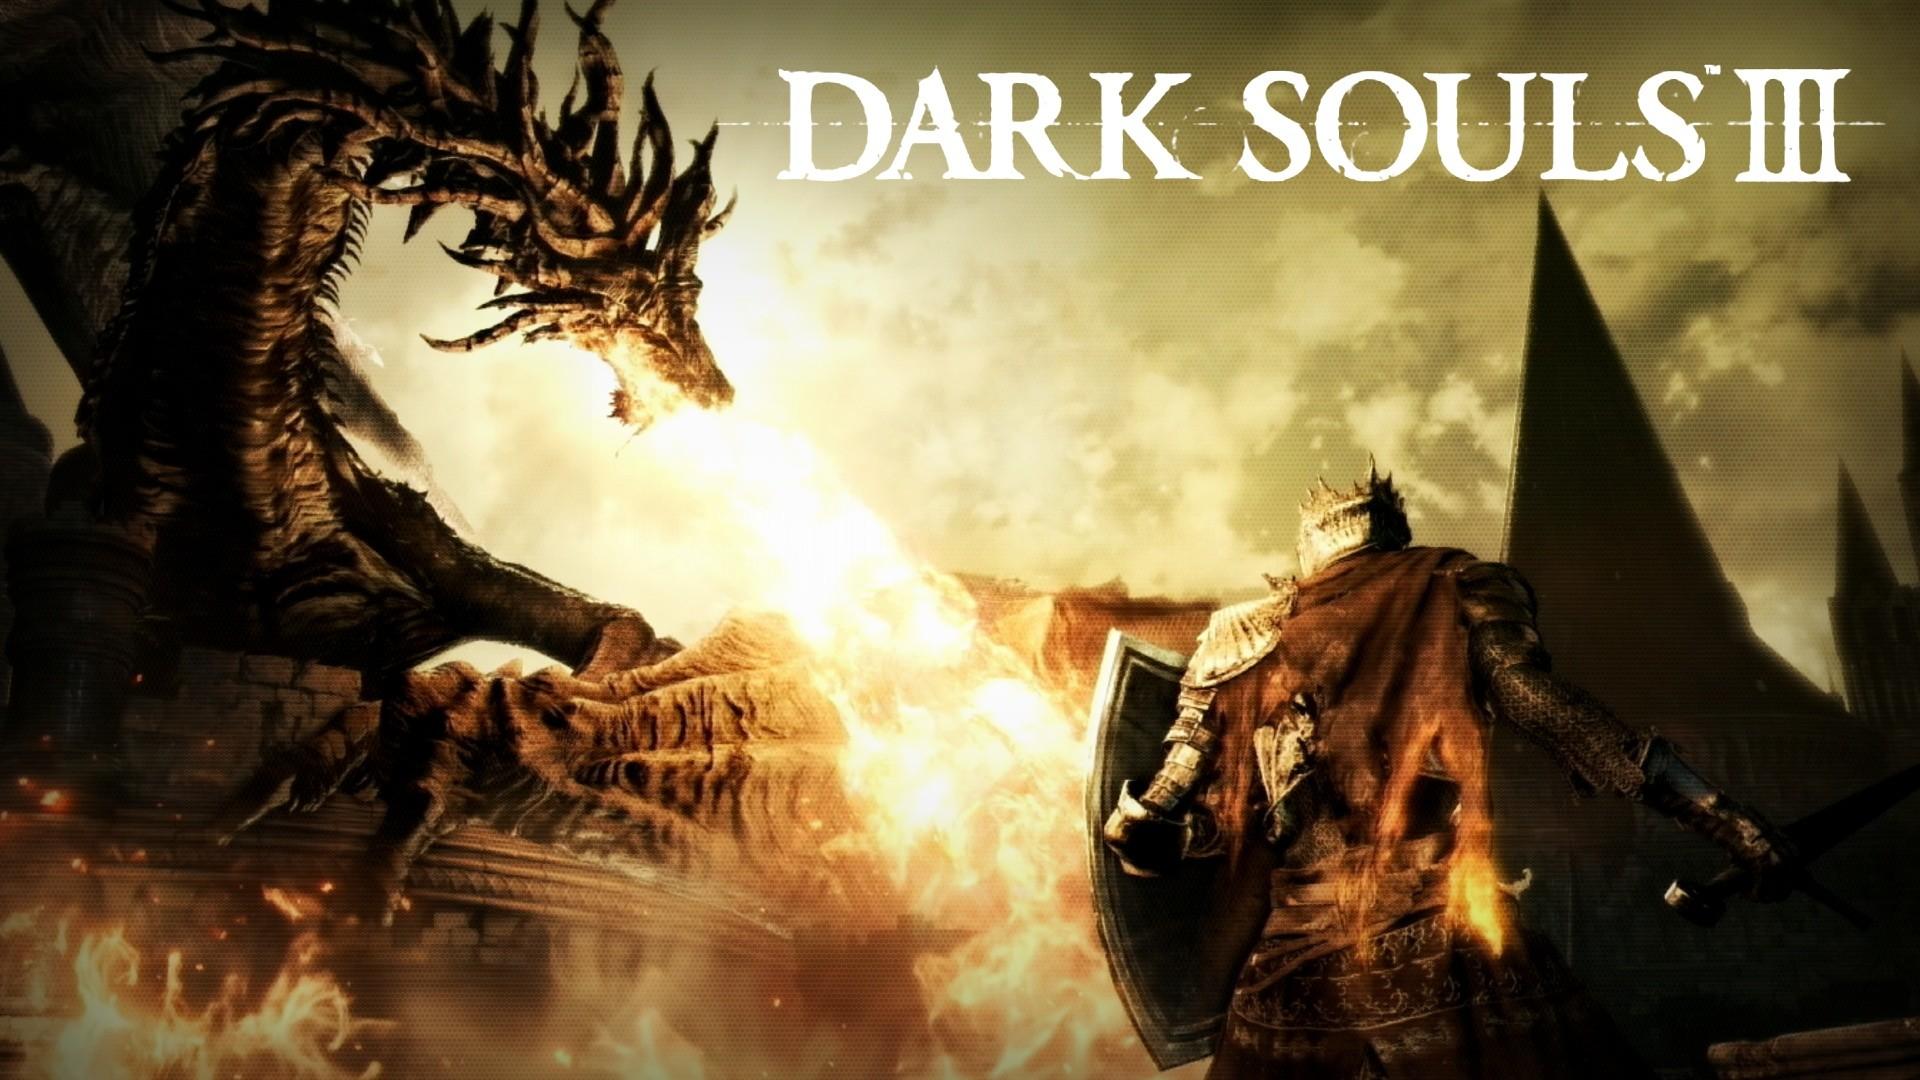 The New Dark Souls DLC looks Dope!